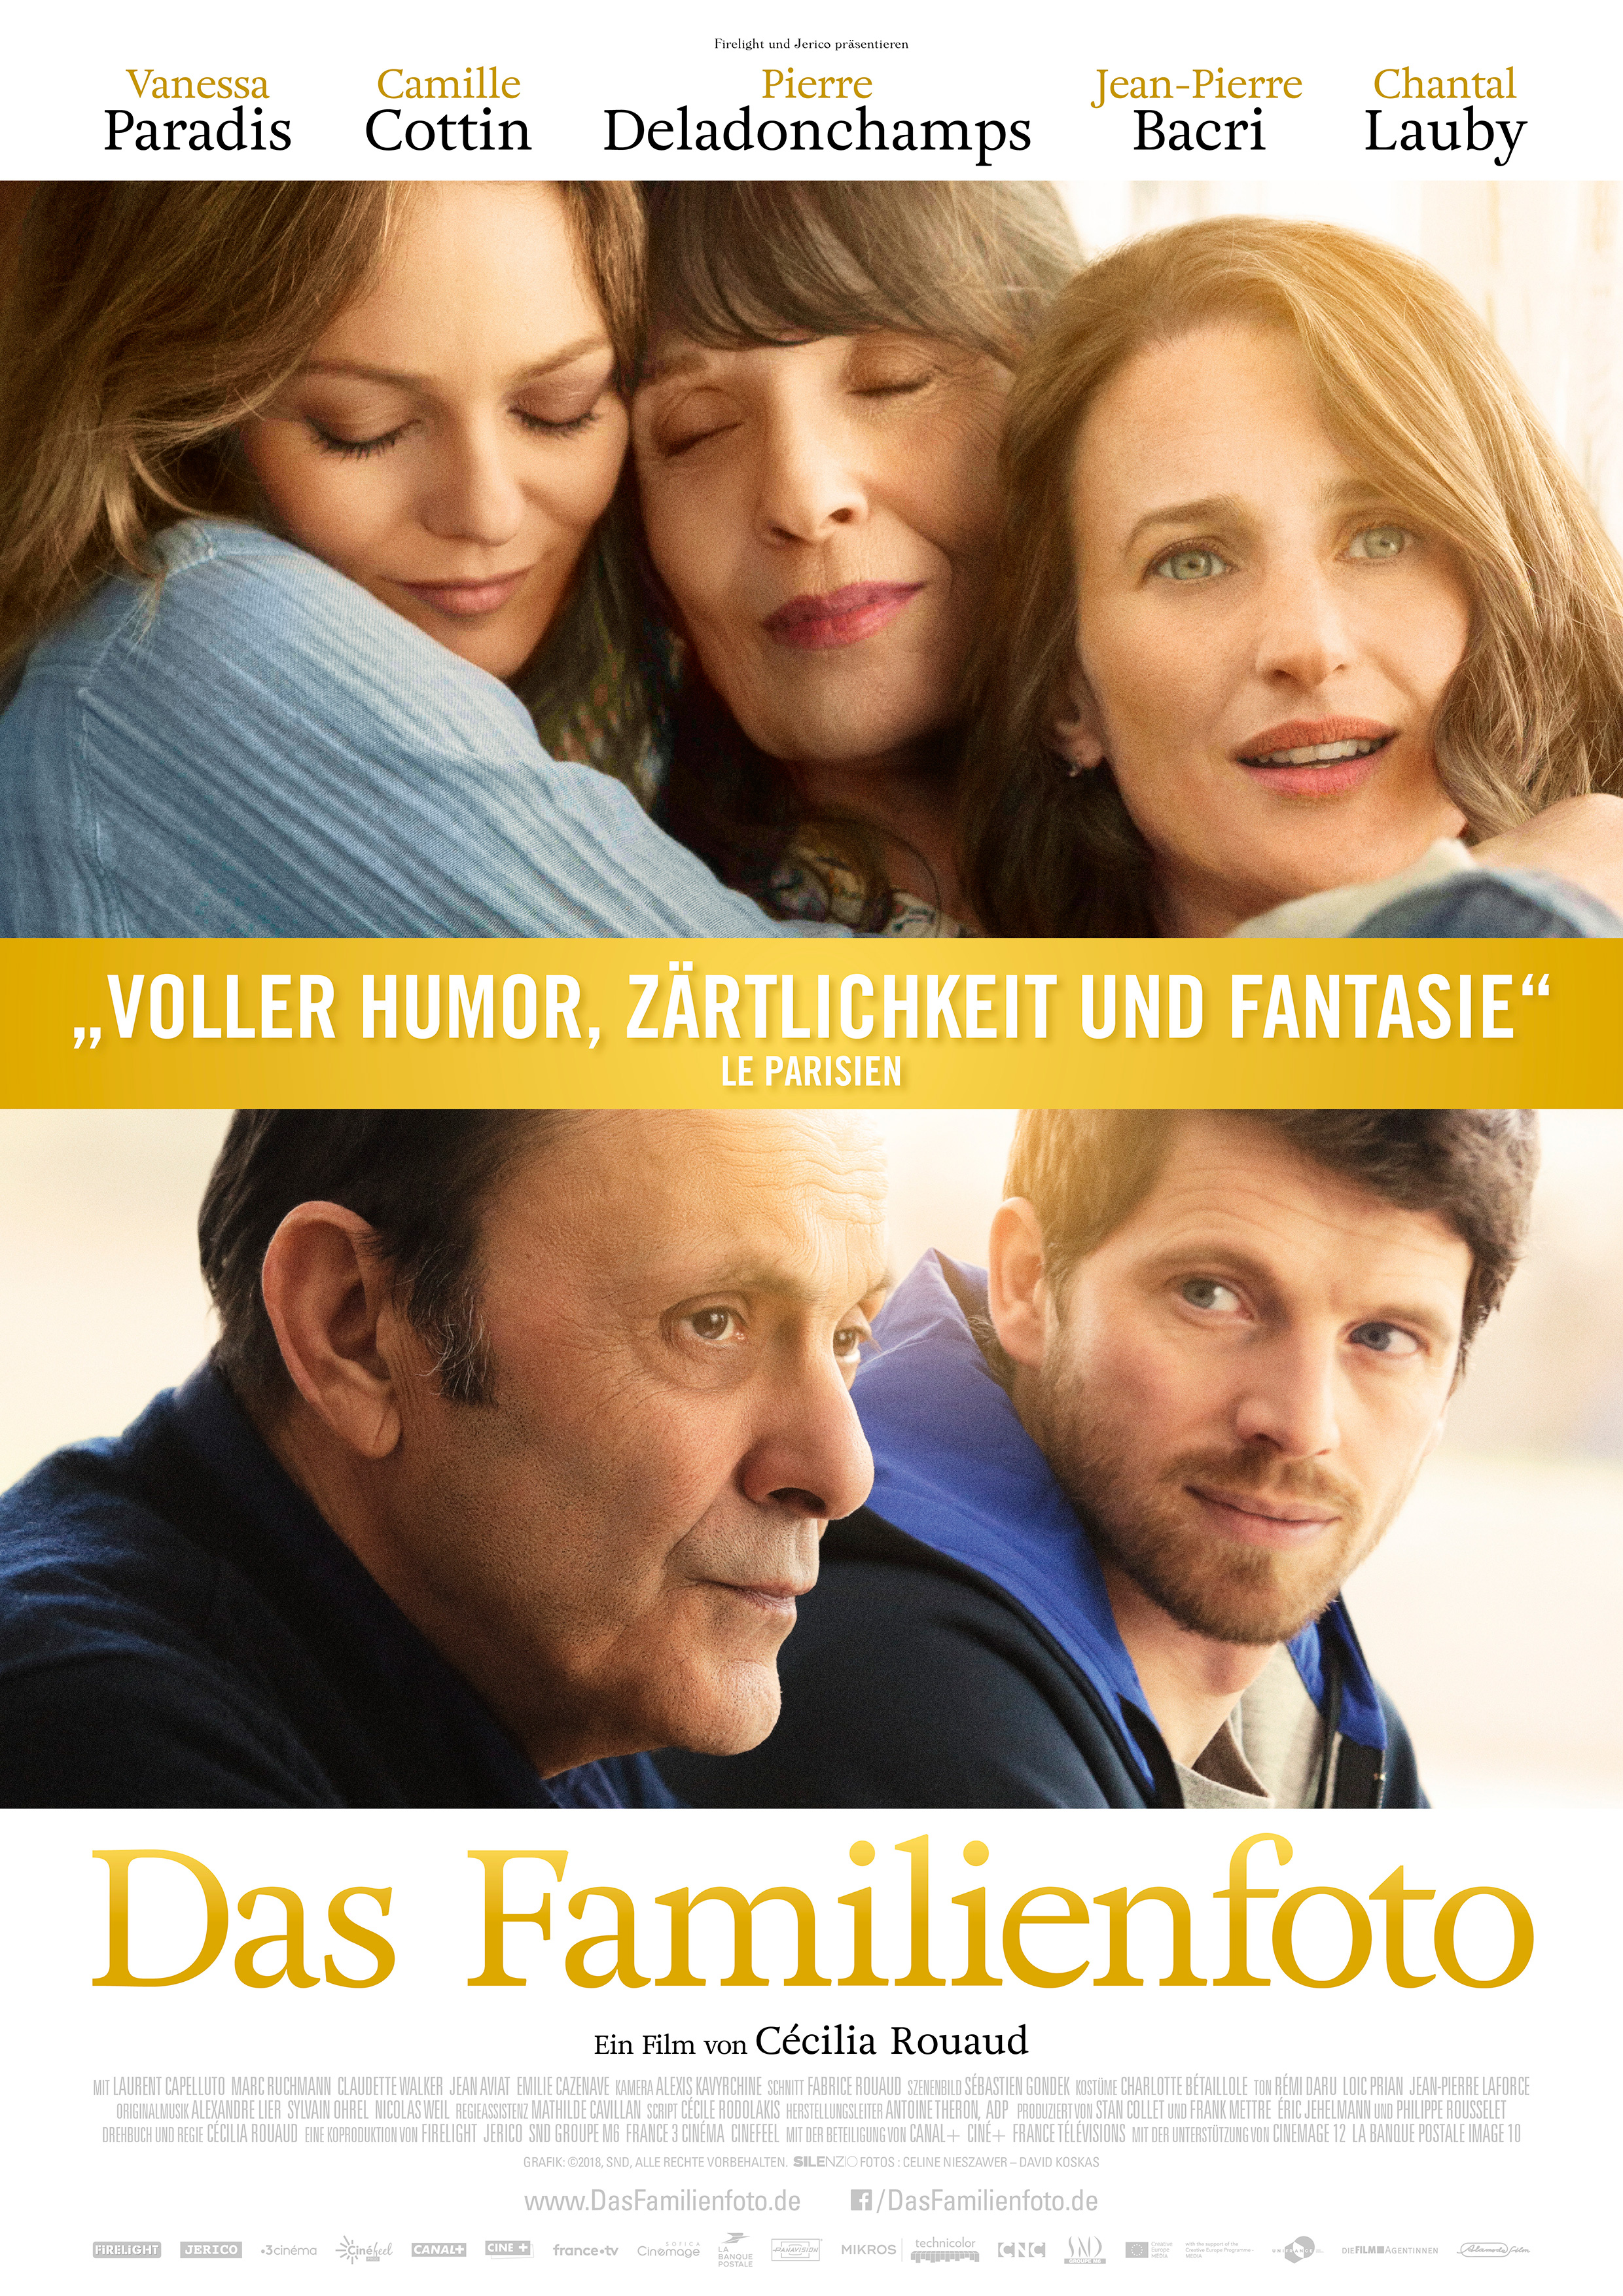 Das Familienfoto Film 2018 Trailer Kritik Kino De